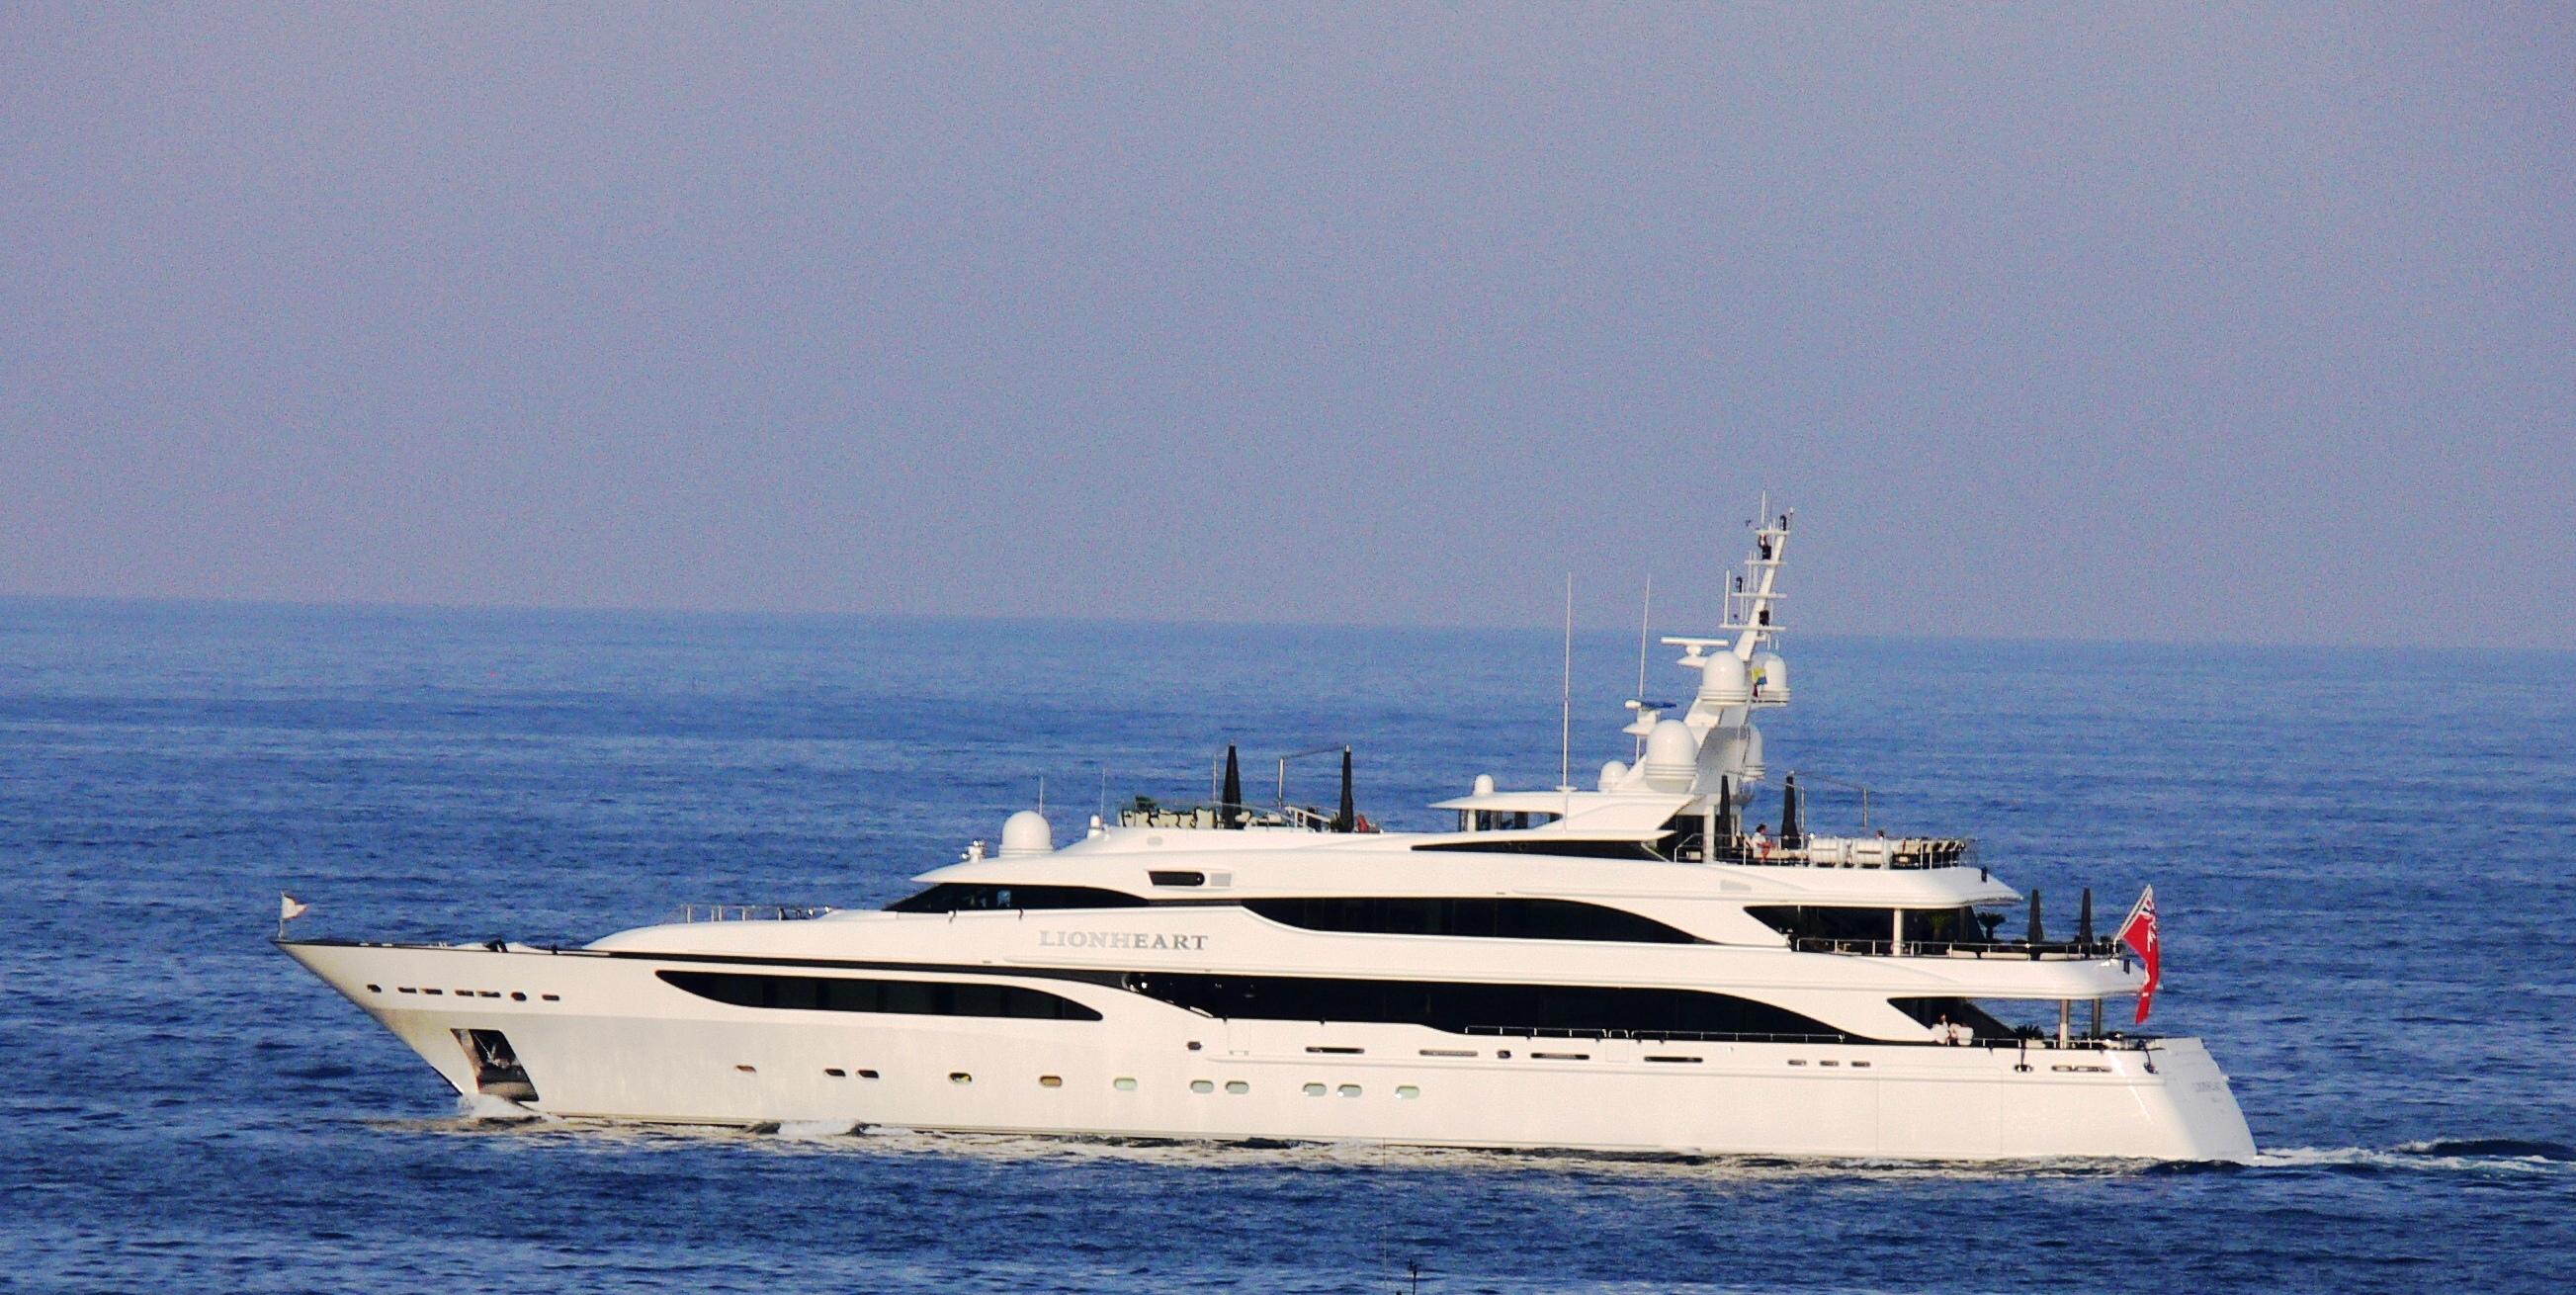 yacht-lion-heart